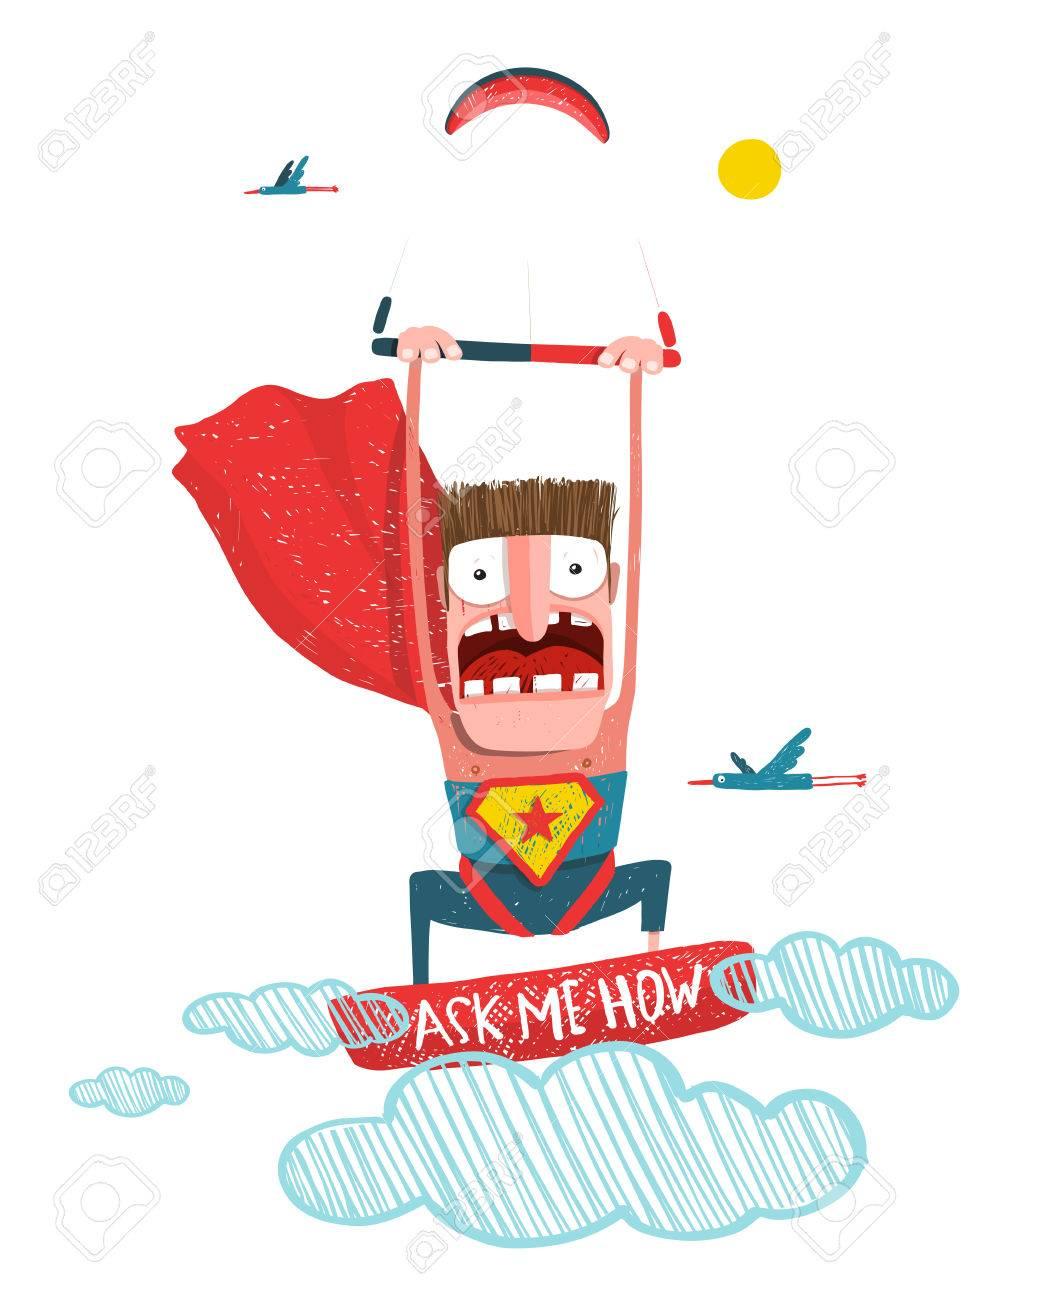 Scared Kite Boarding Superhero Cartoon In Costume With Kite